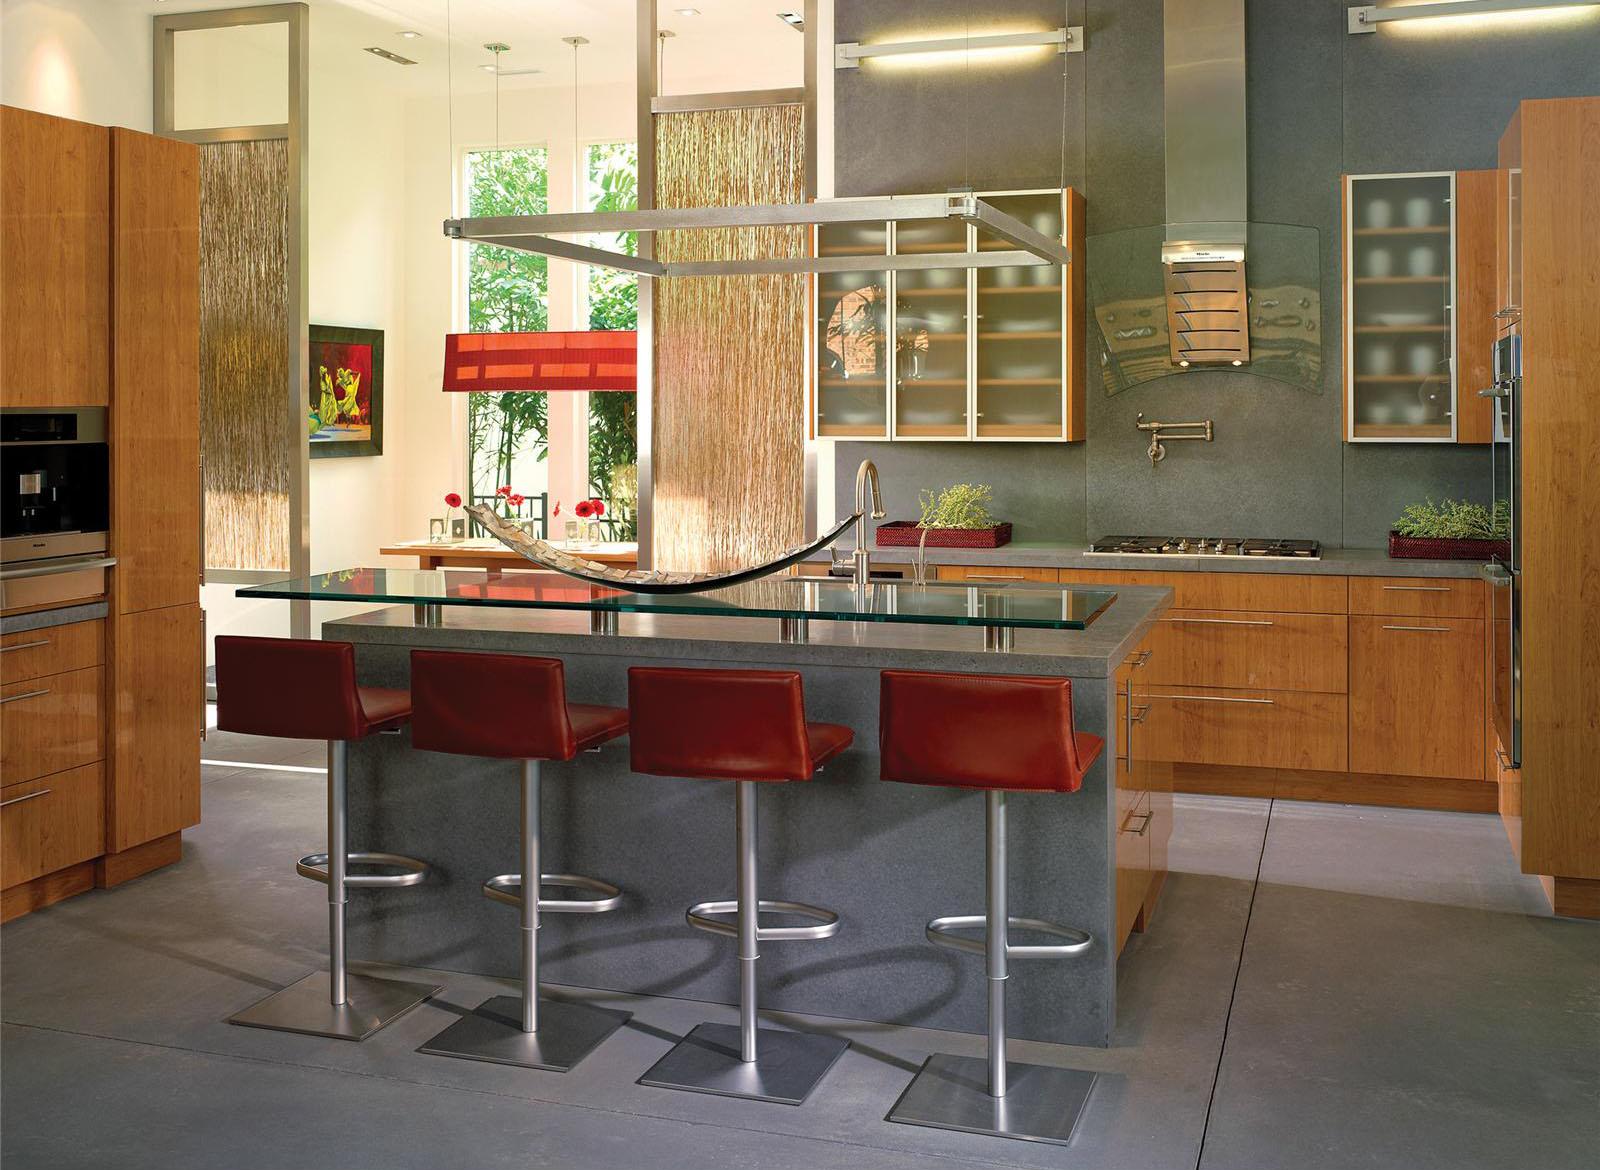 Oak kitchen pantry storage cabinet Photo - 4